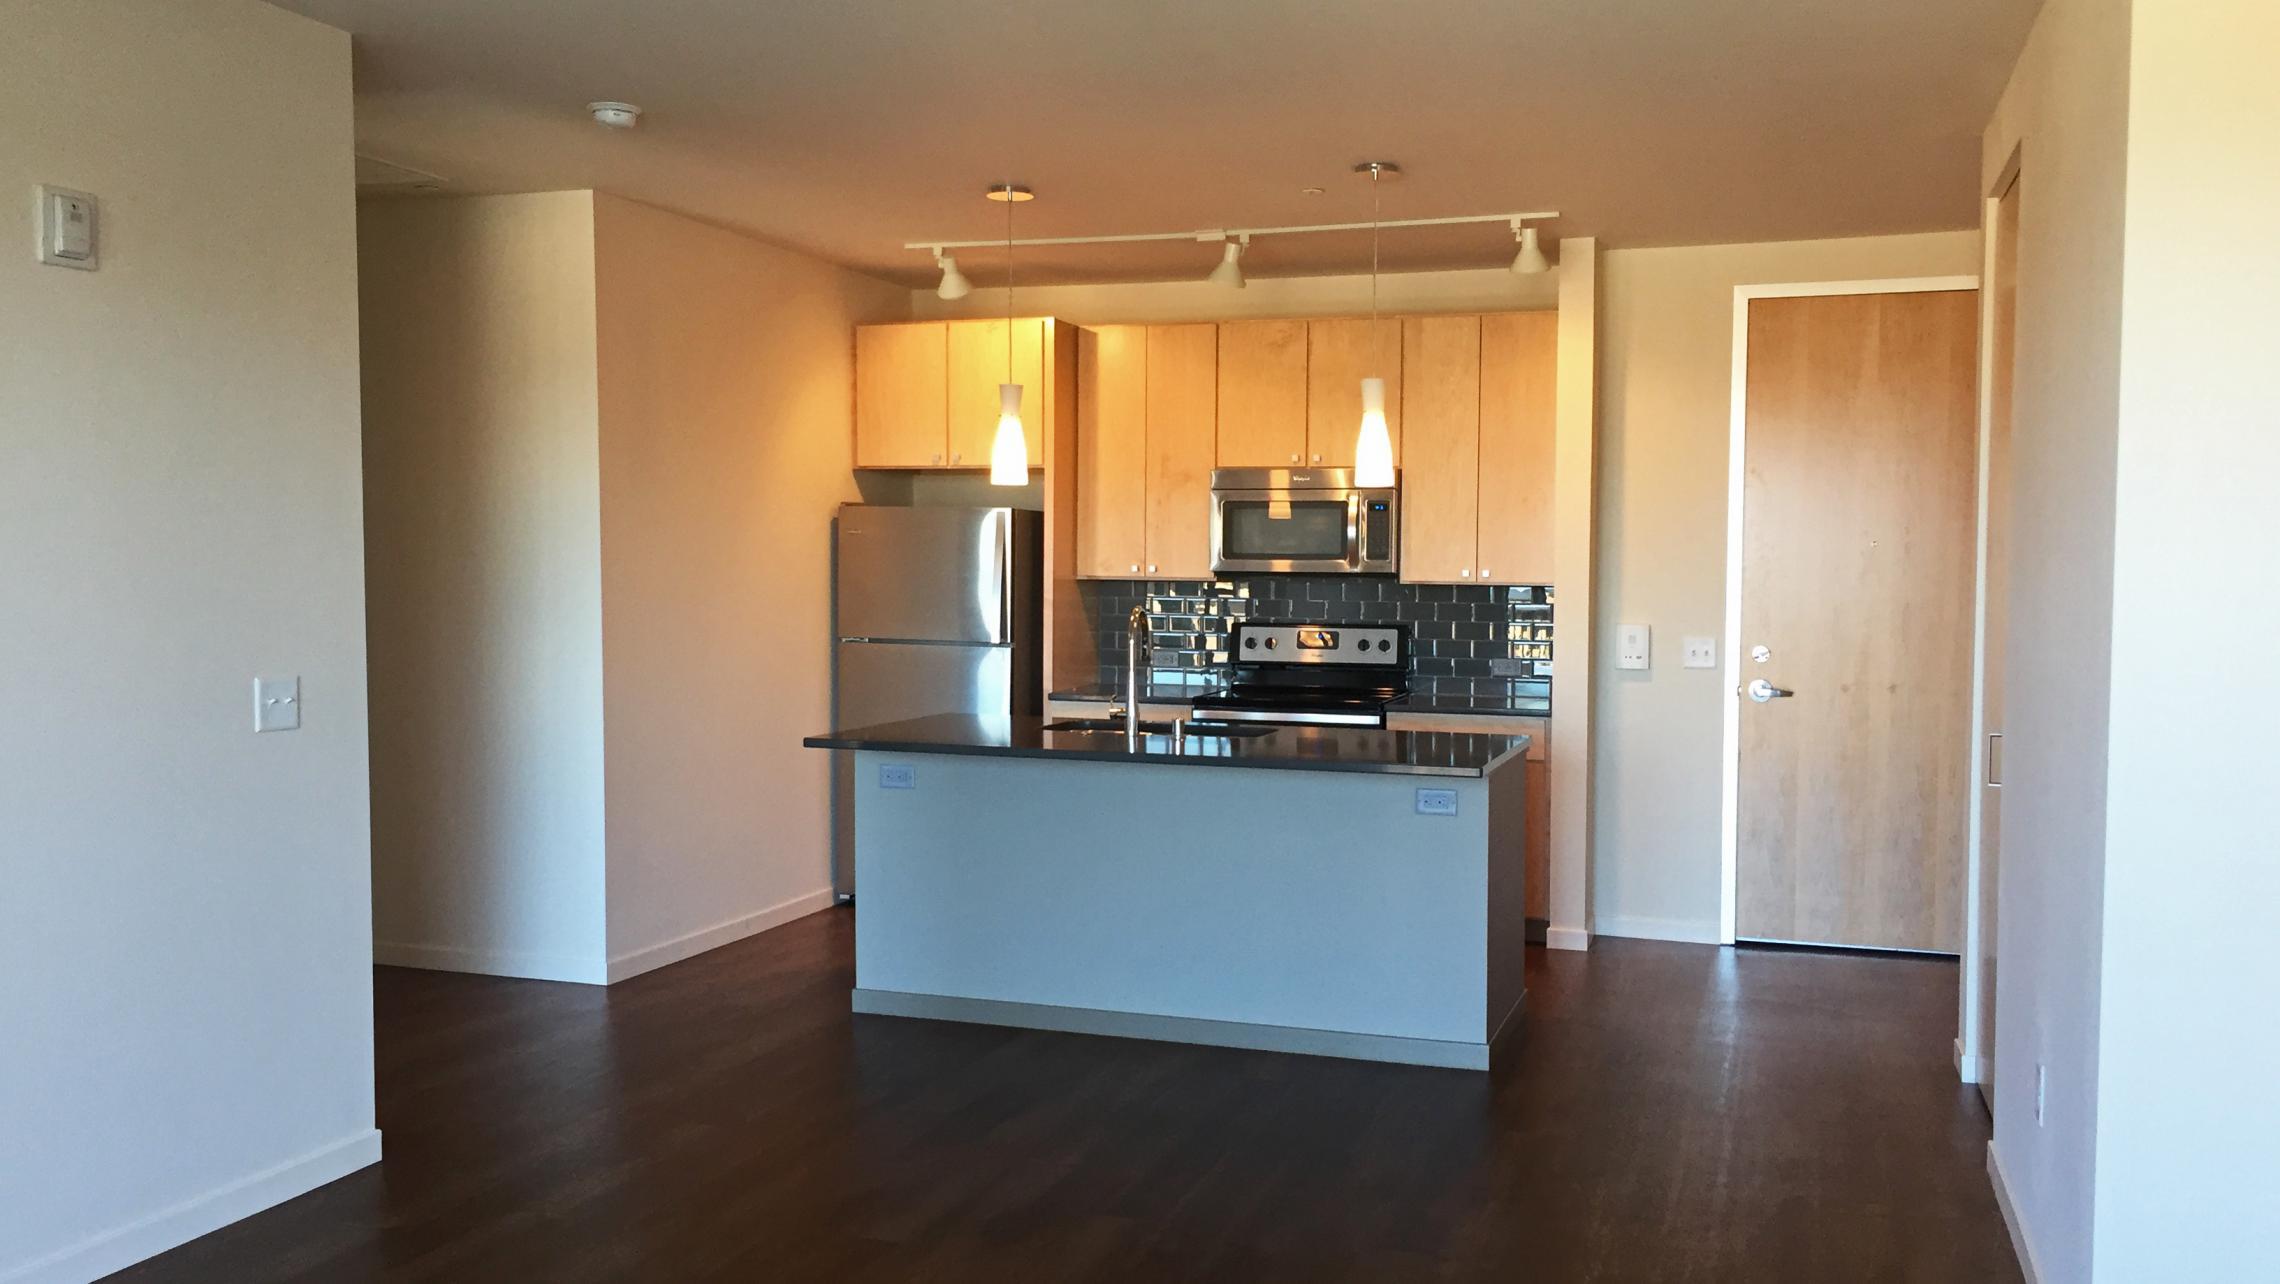 ULI Nine Line Apartment 220 - Kitchen